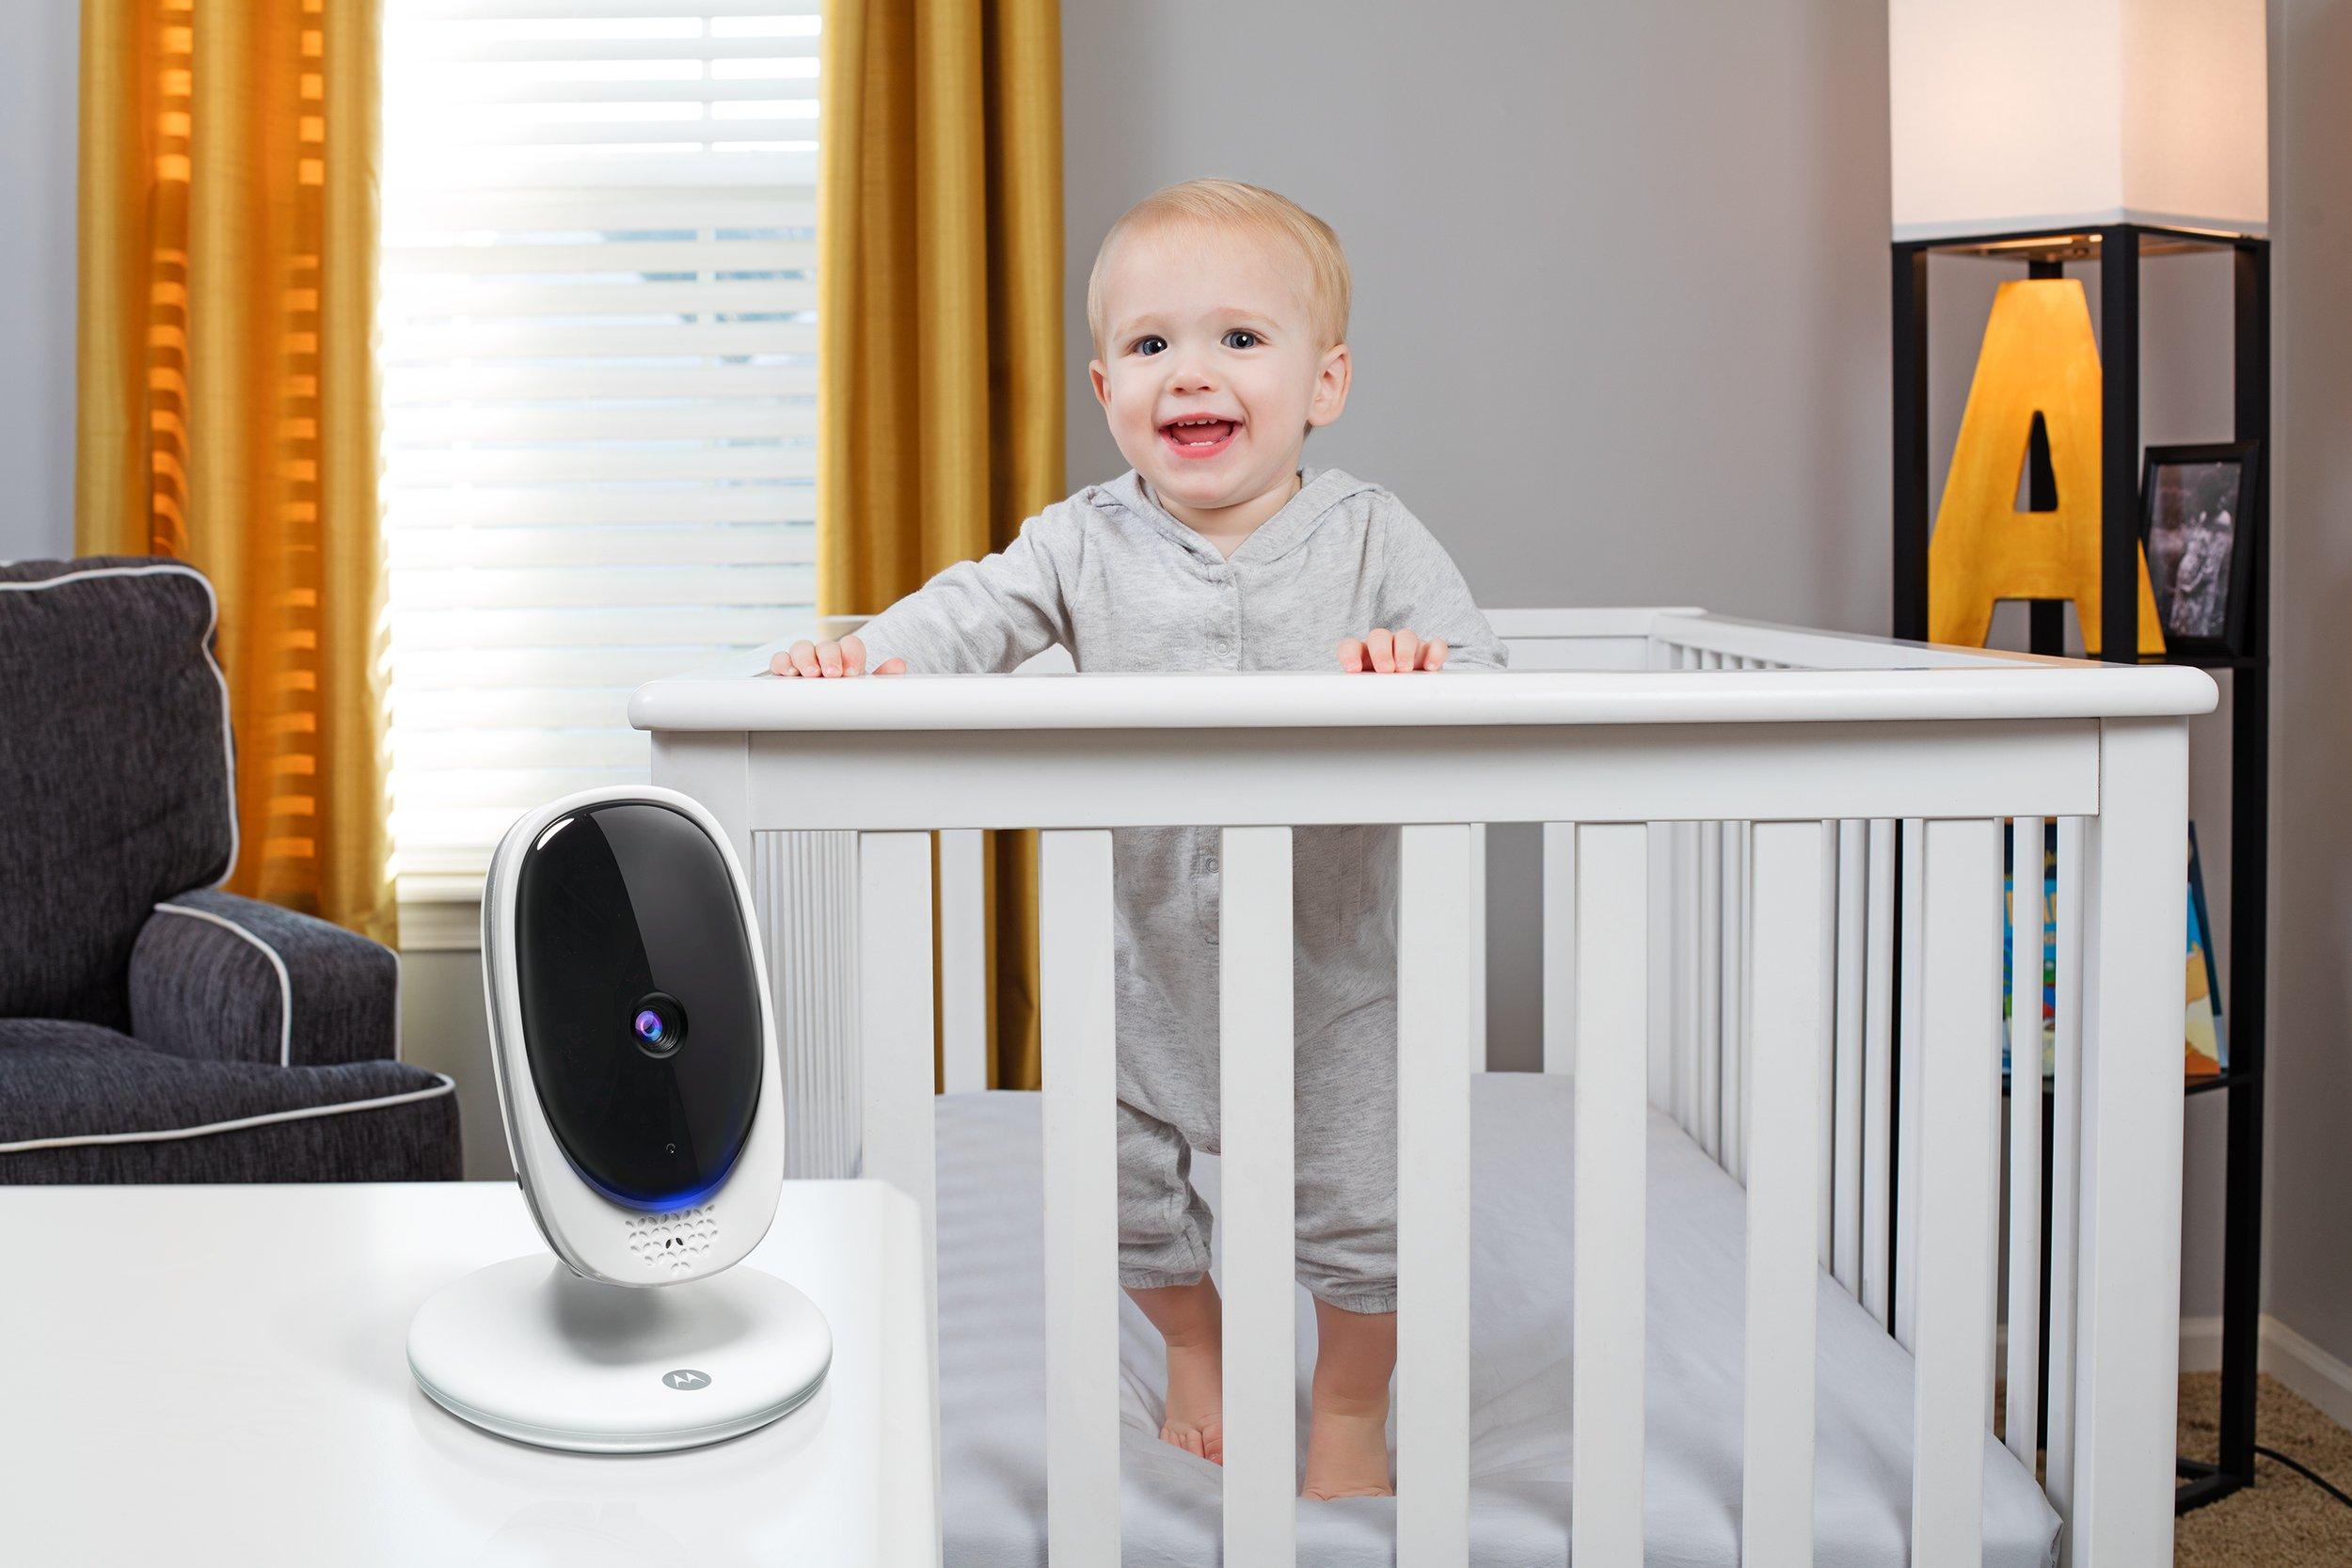 Motorola Comfort 50 Digital Video Audio Baby Monitor with 5 inch Color Screen by Motorola Baby (Image #4)